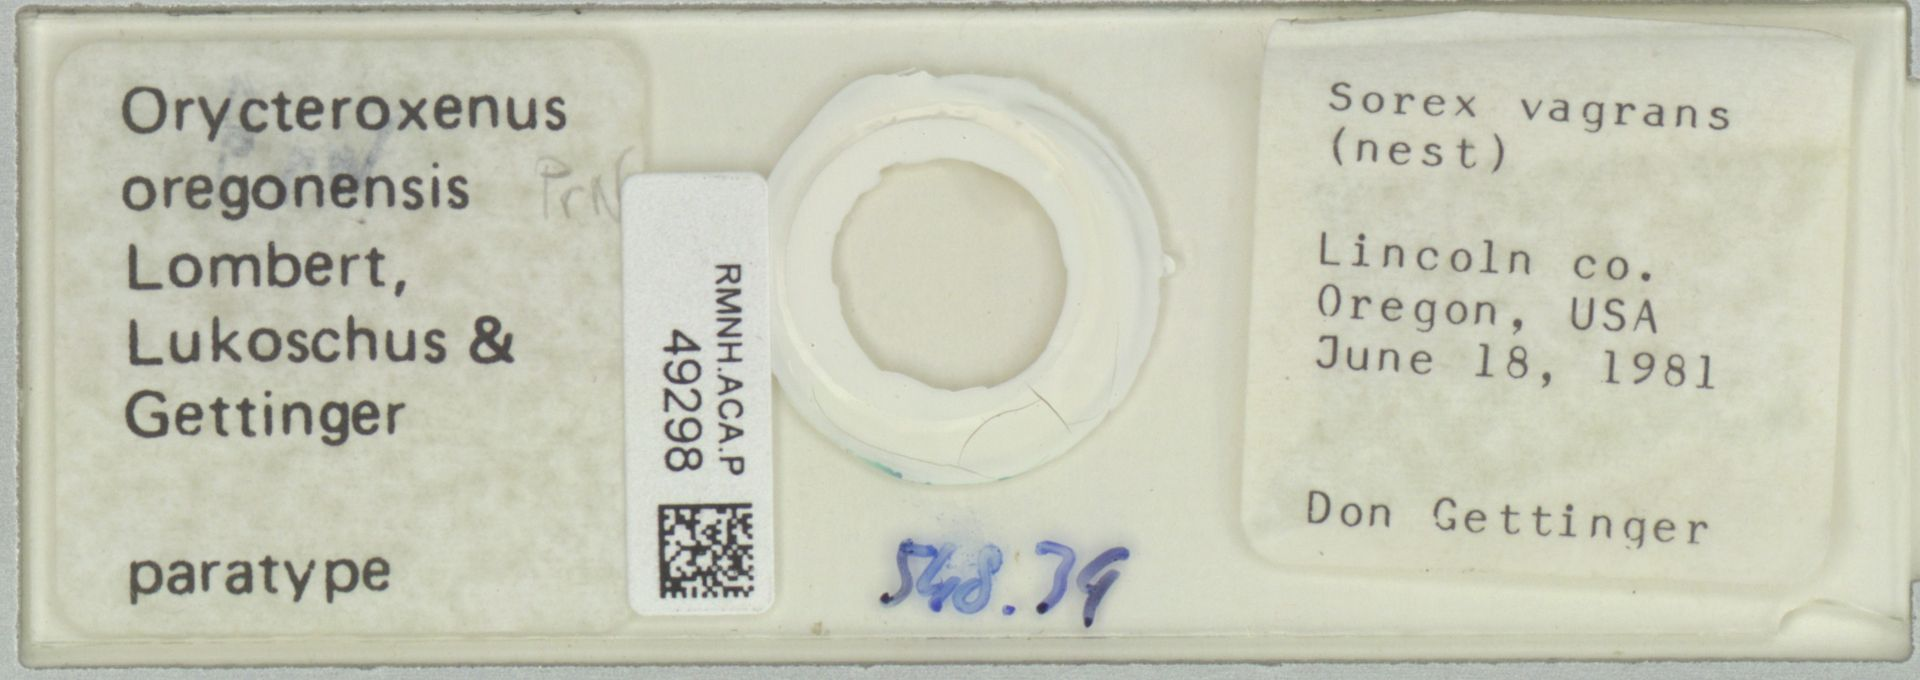 RMNH.ACA.P.49298   Orycteroxenus oregonensis Lombert, Lukoschus & Gettinger